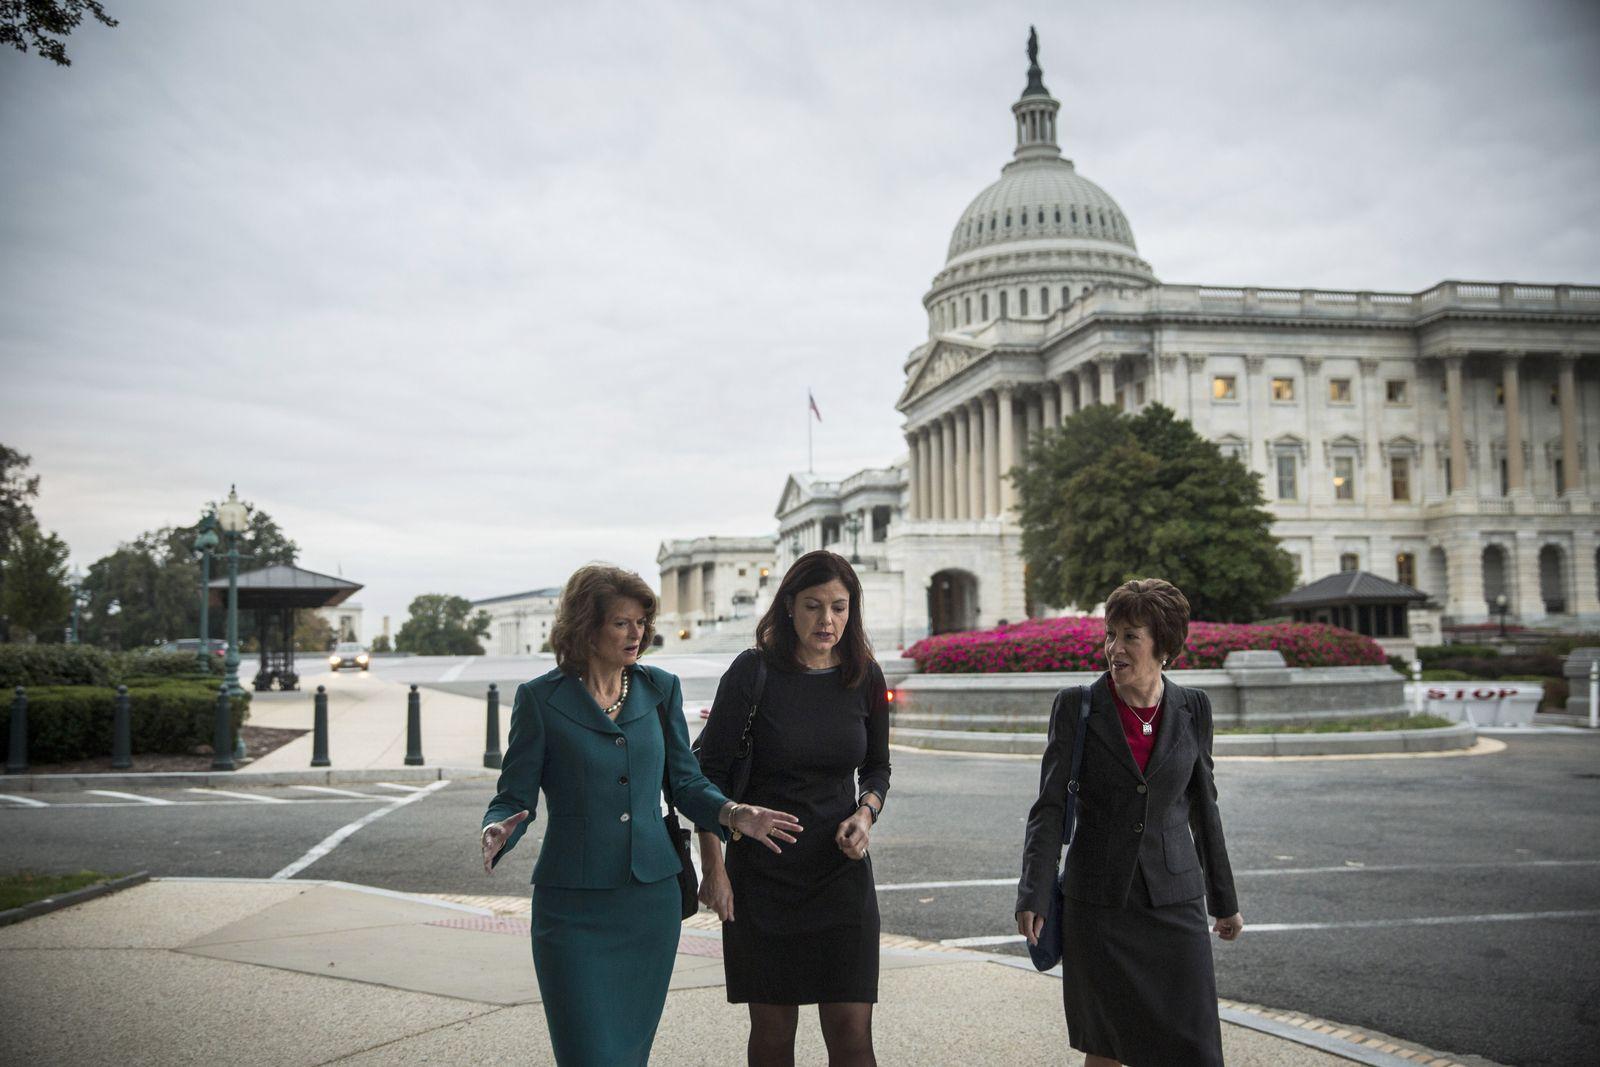 Lisa Murkowski / Kelly Ayotte / Susan Collins